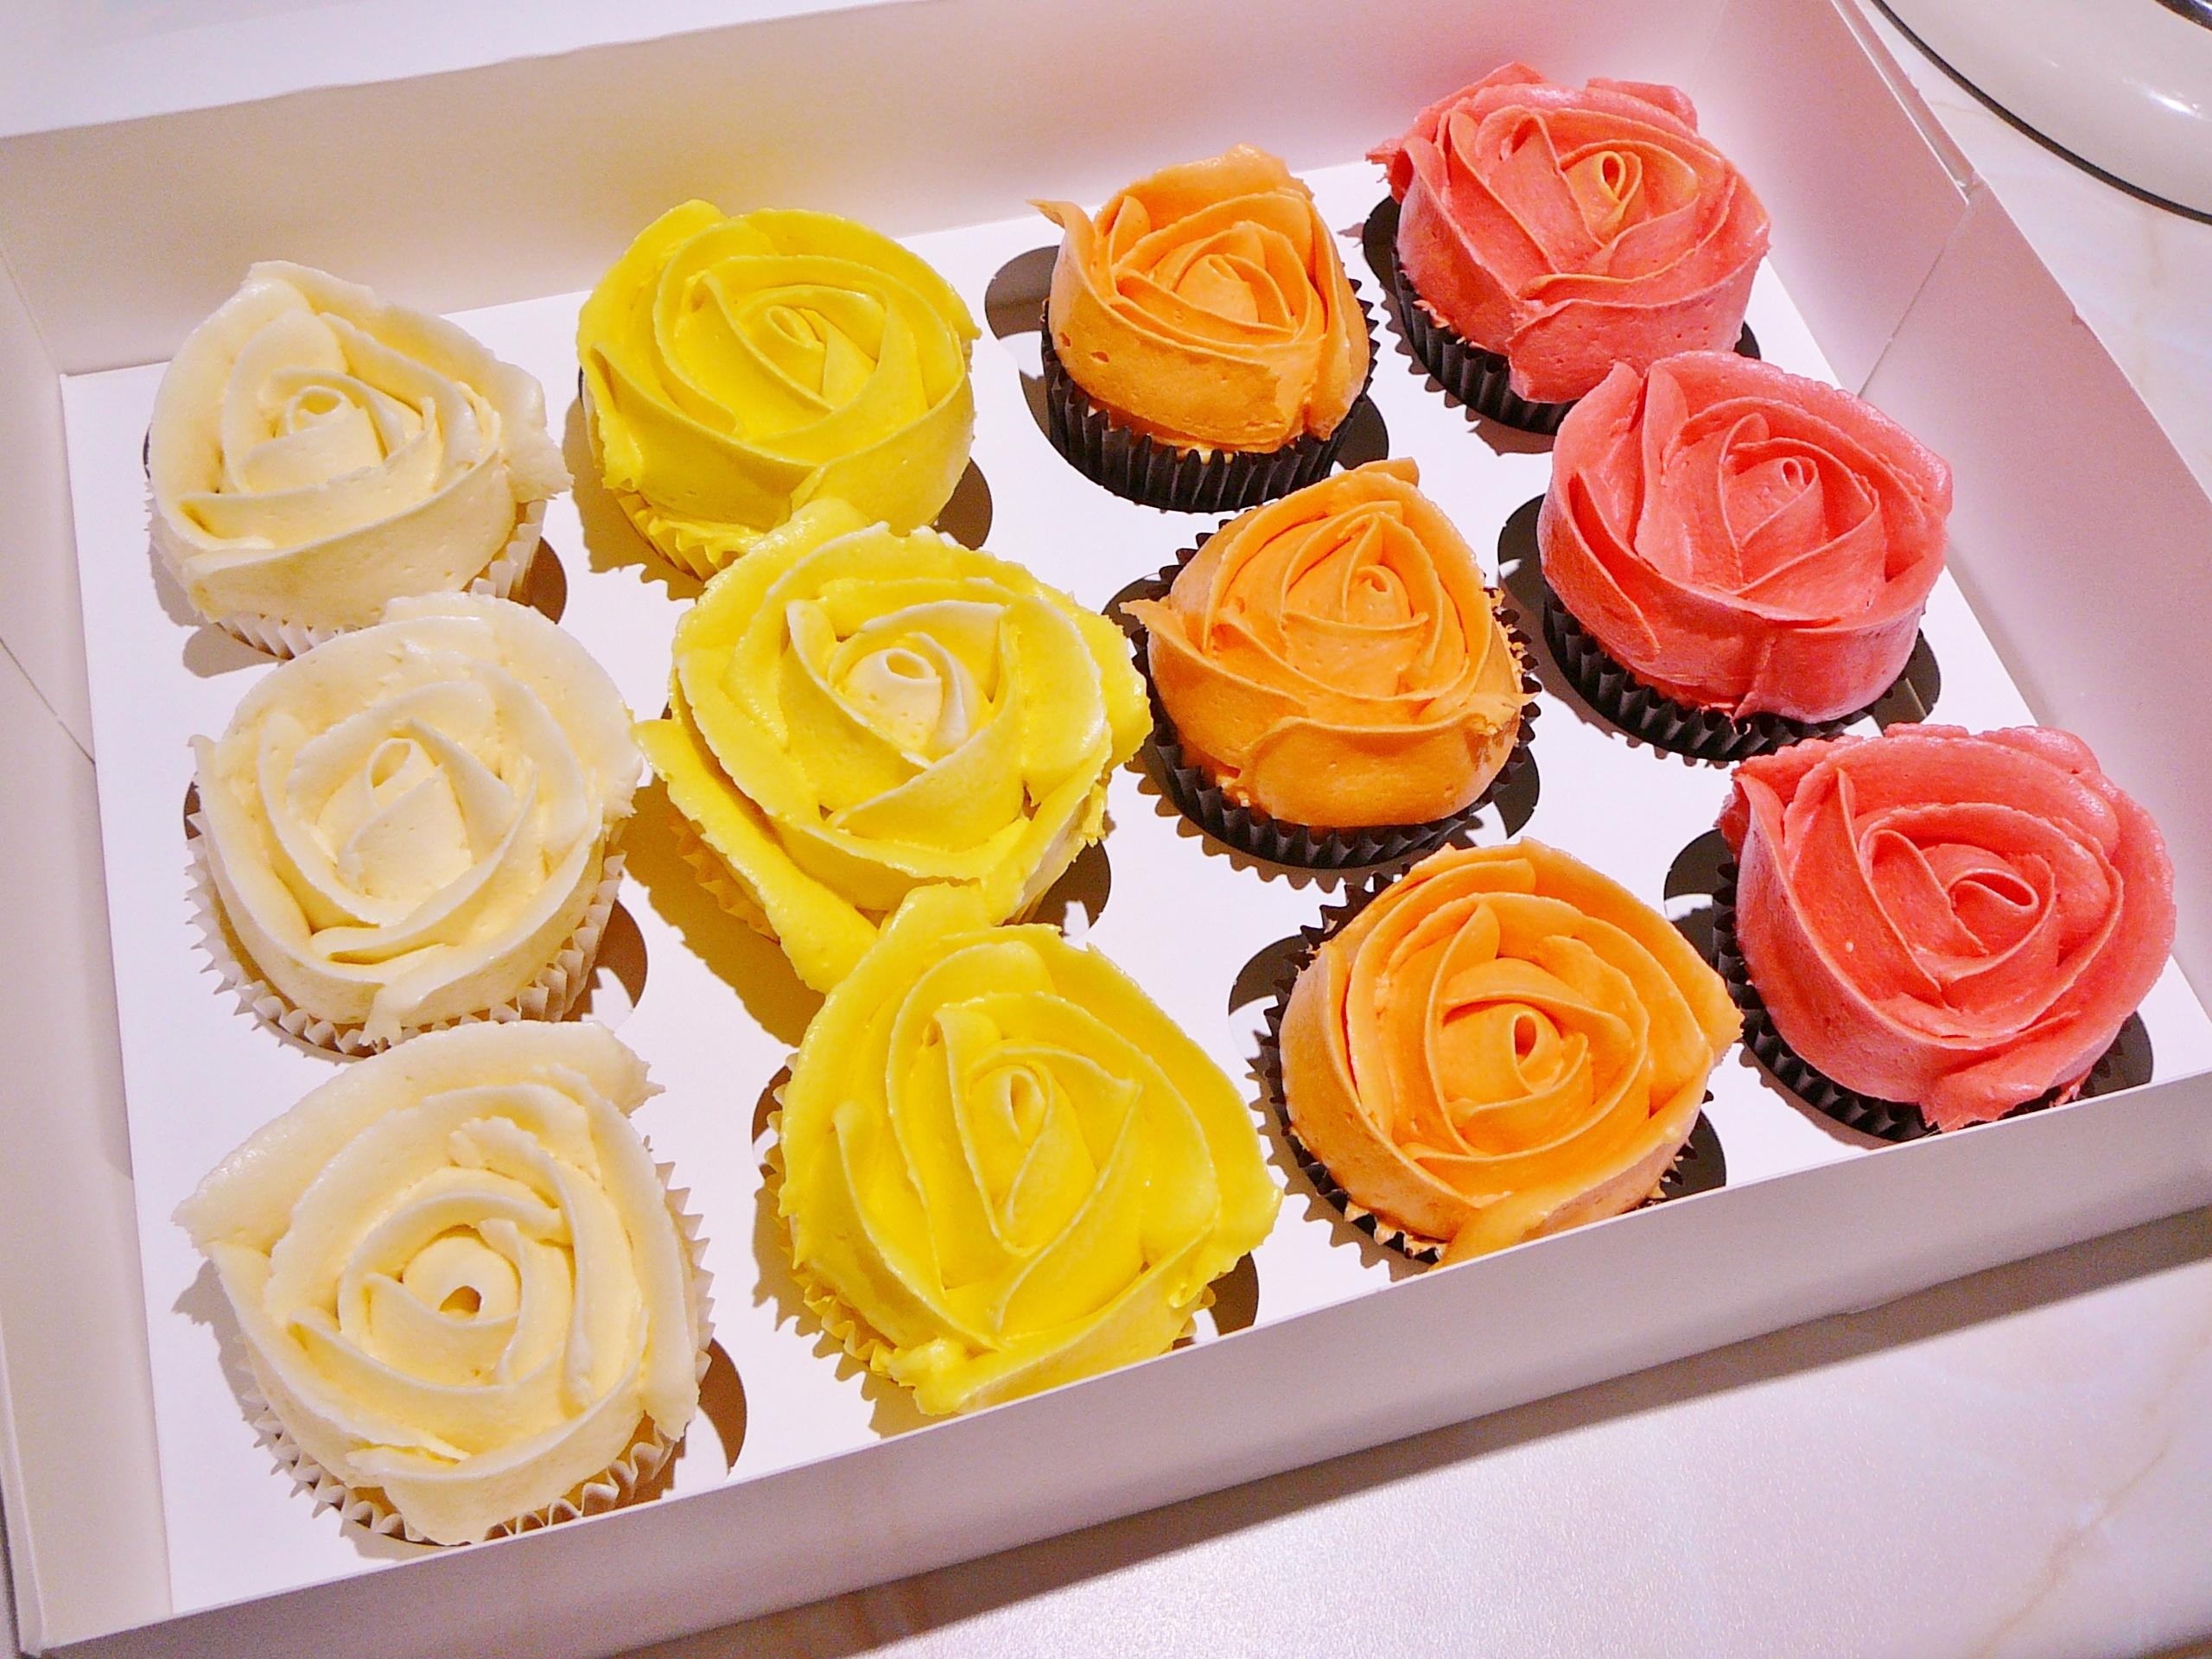 3D rose cupcakes